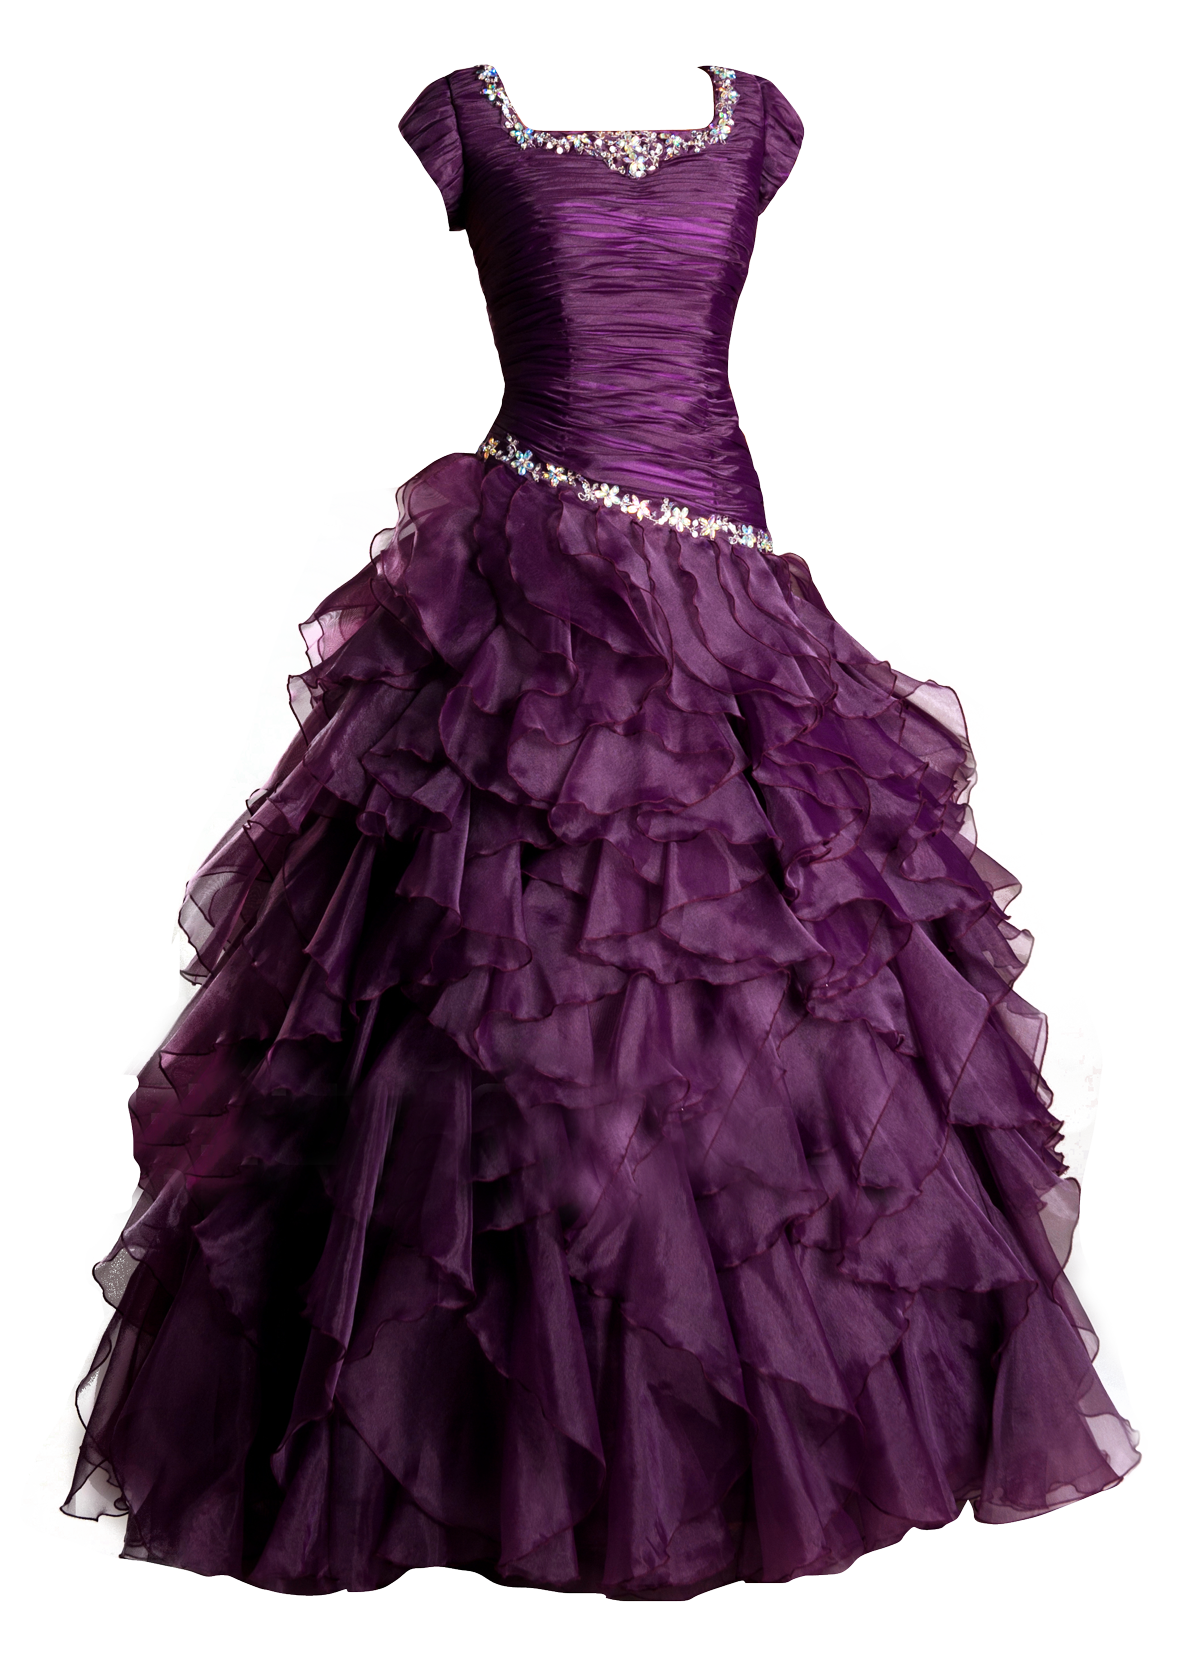 Dress PNG - 18723